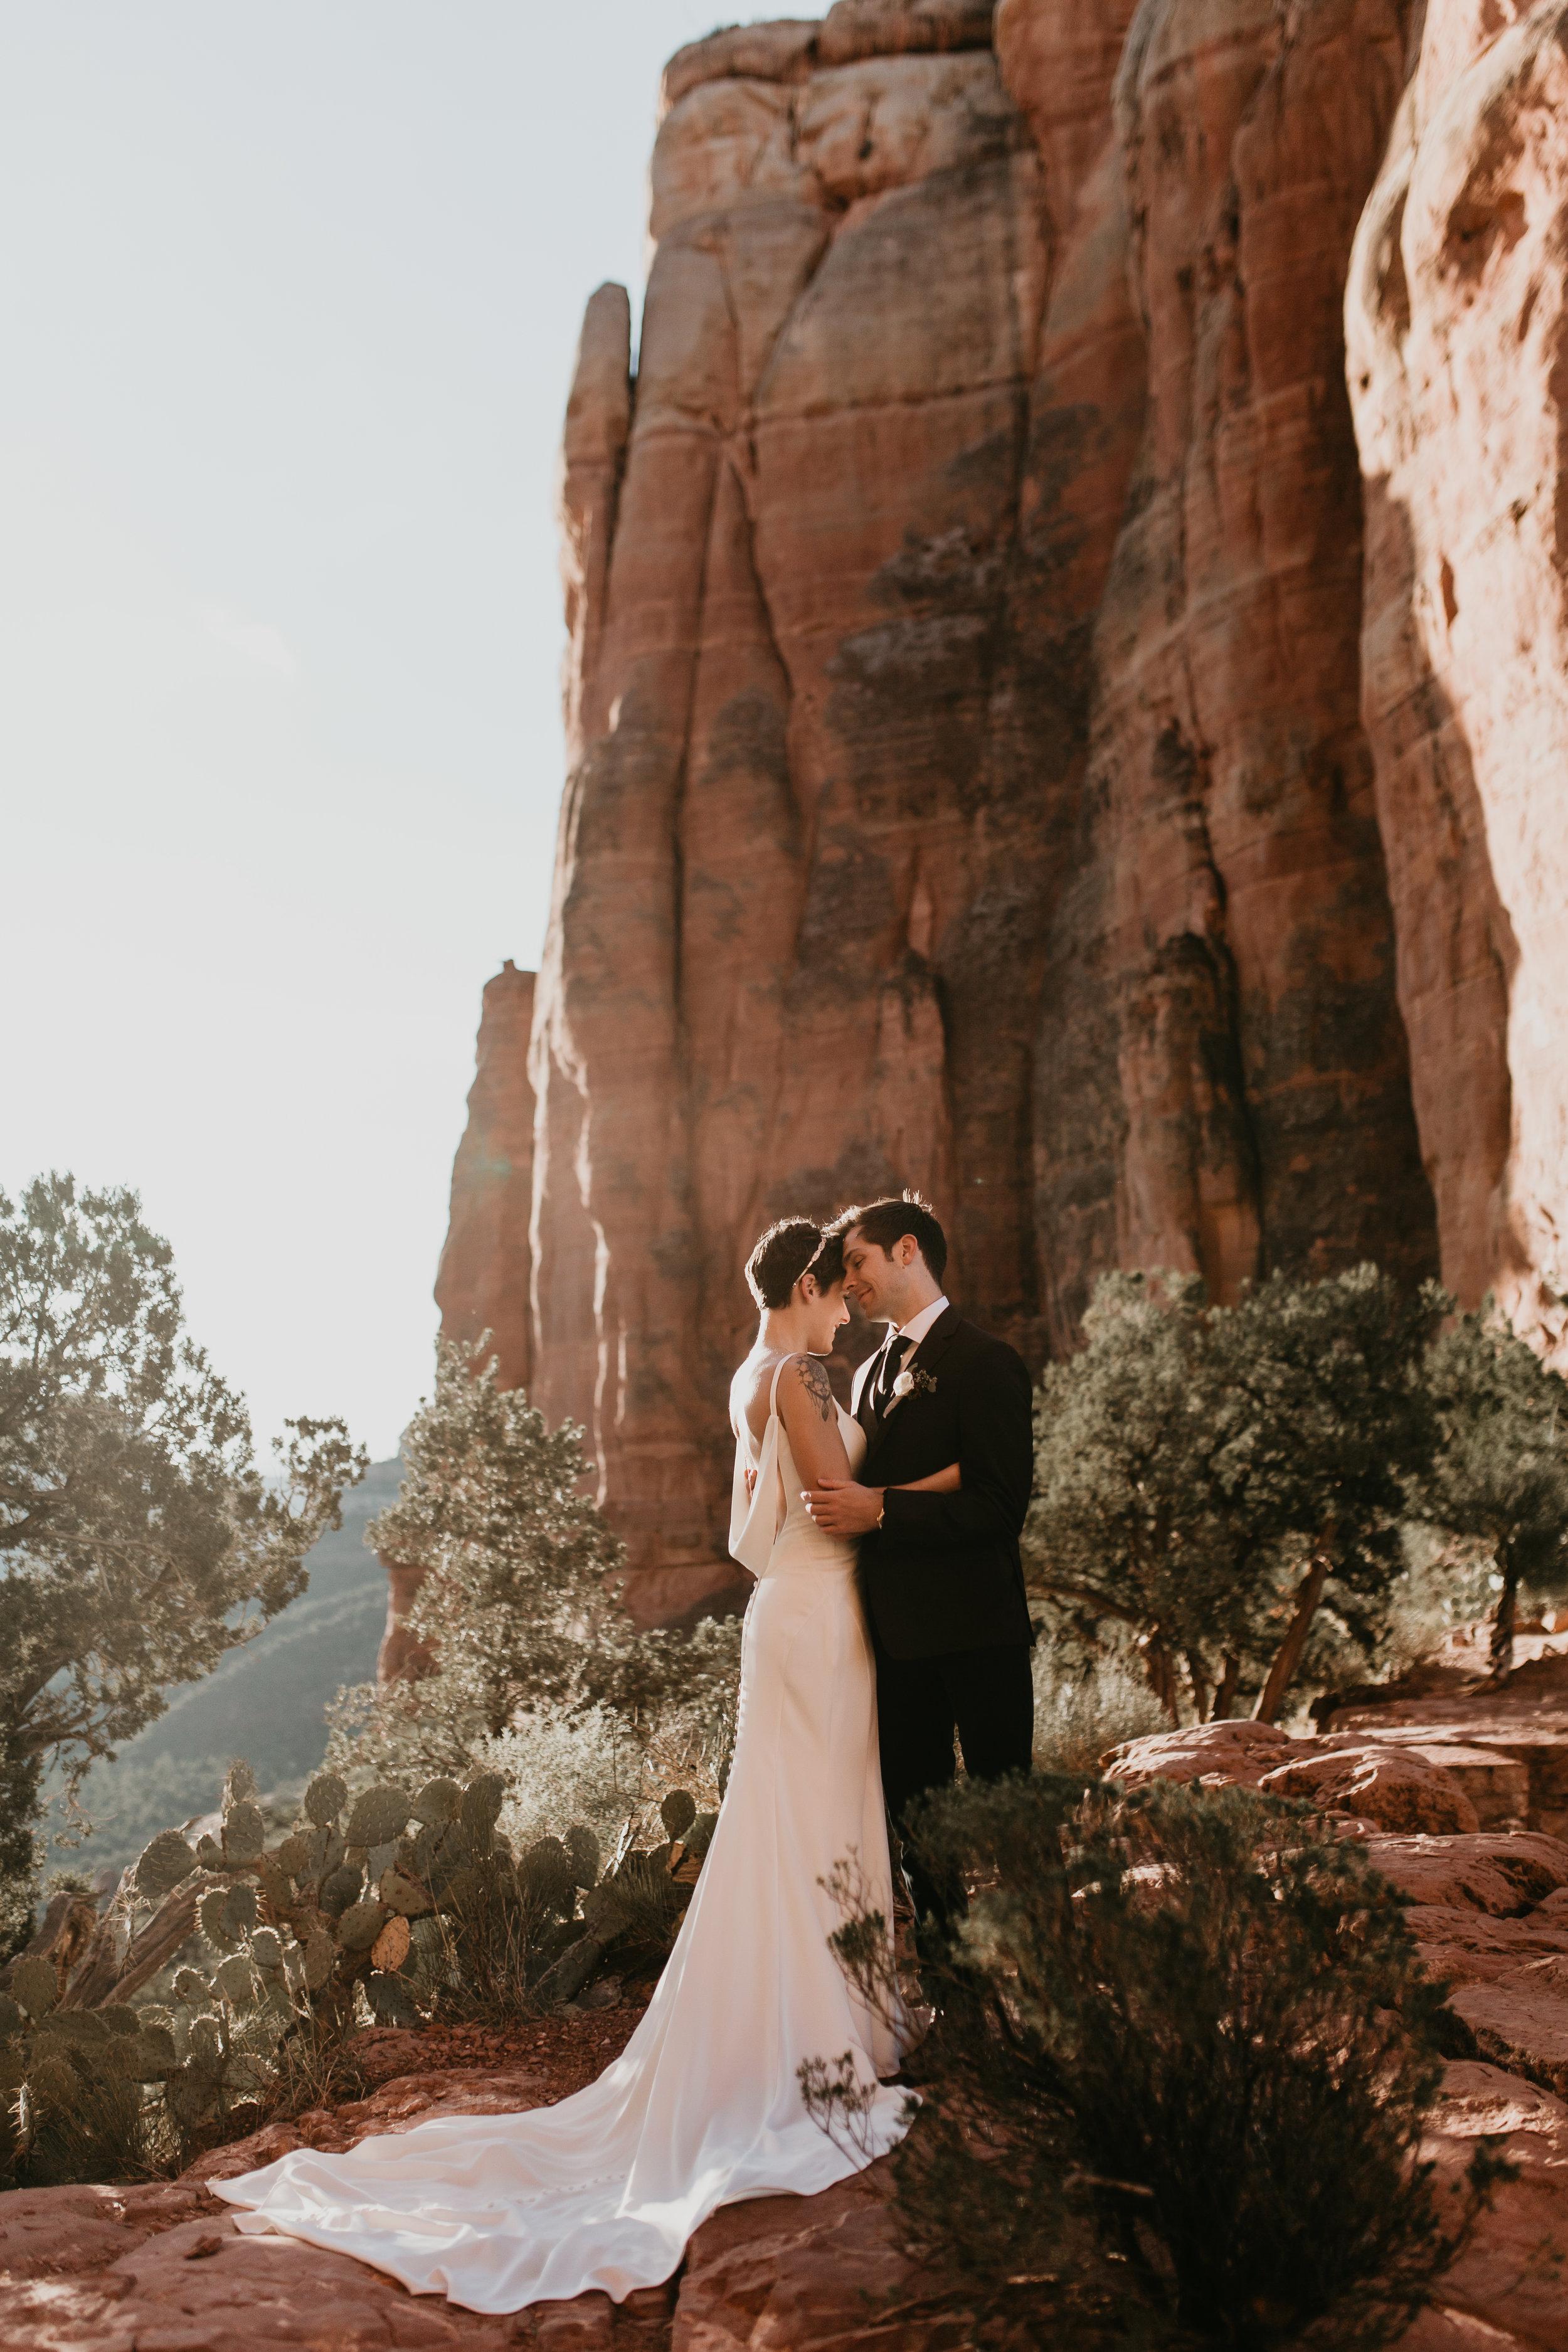 nicole-daacke-photography-sedona-arizona-destination-elopement-wedding-photographer-catherdral-rock-hiking-elopement-sedona-river-elopement-photos-desert-rock-wedding-photographer-laid-back-spontaneous-elopement-57.jpg